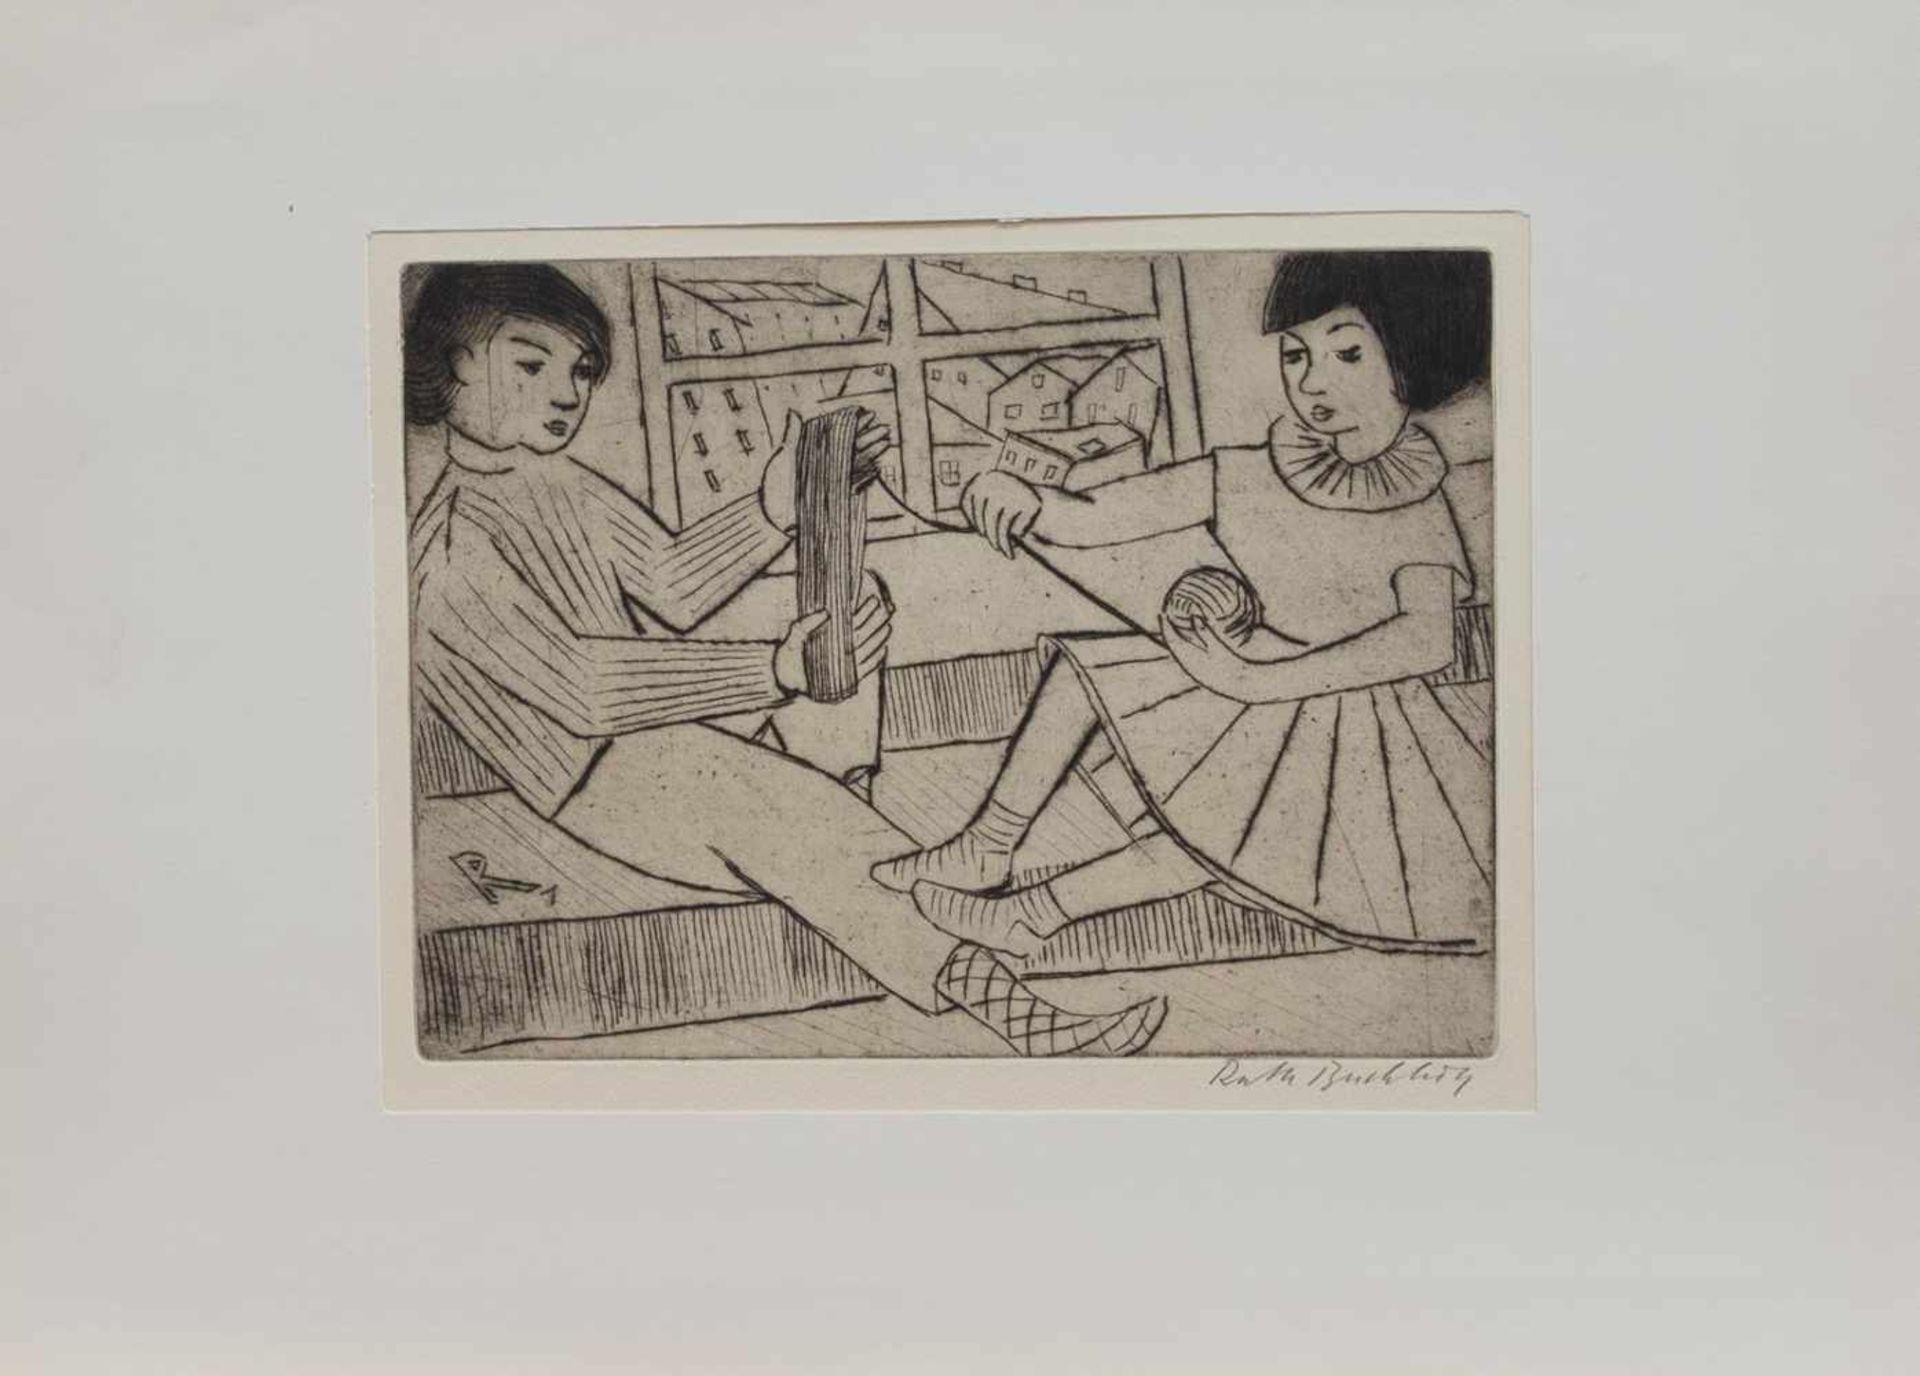 Los 3 - Ruth Buchholz (Hamburg 1911 - 2002 ebenda, deutsche Malerin u. Grafikerin, Std. a.d. Hamburger